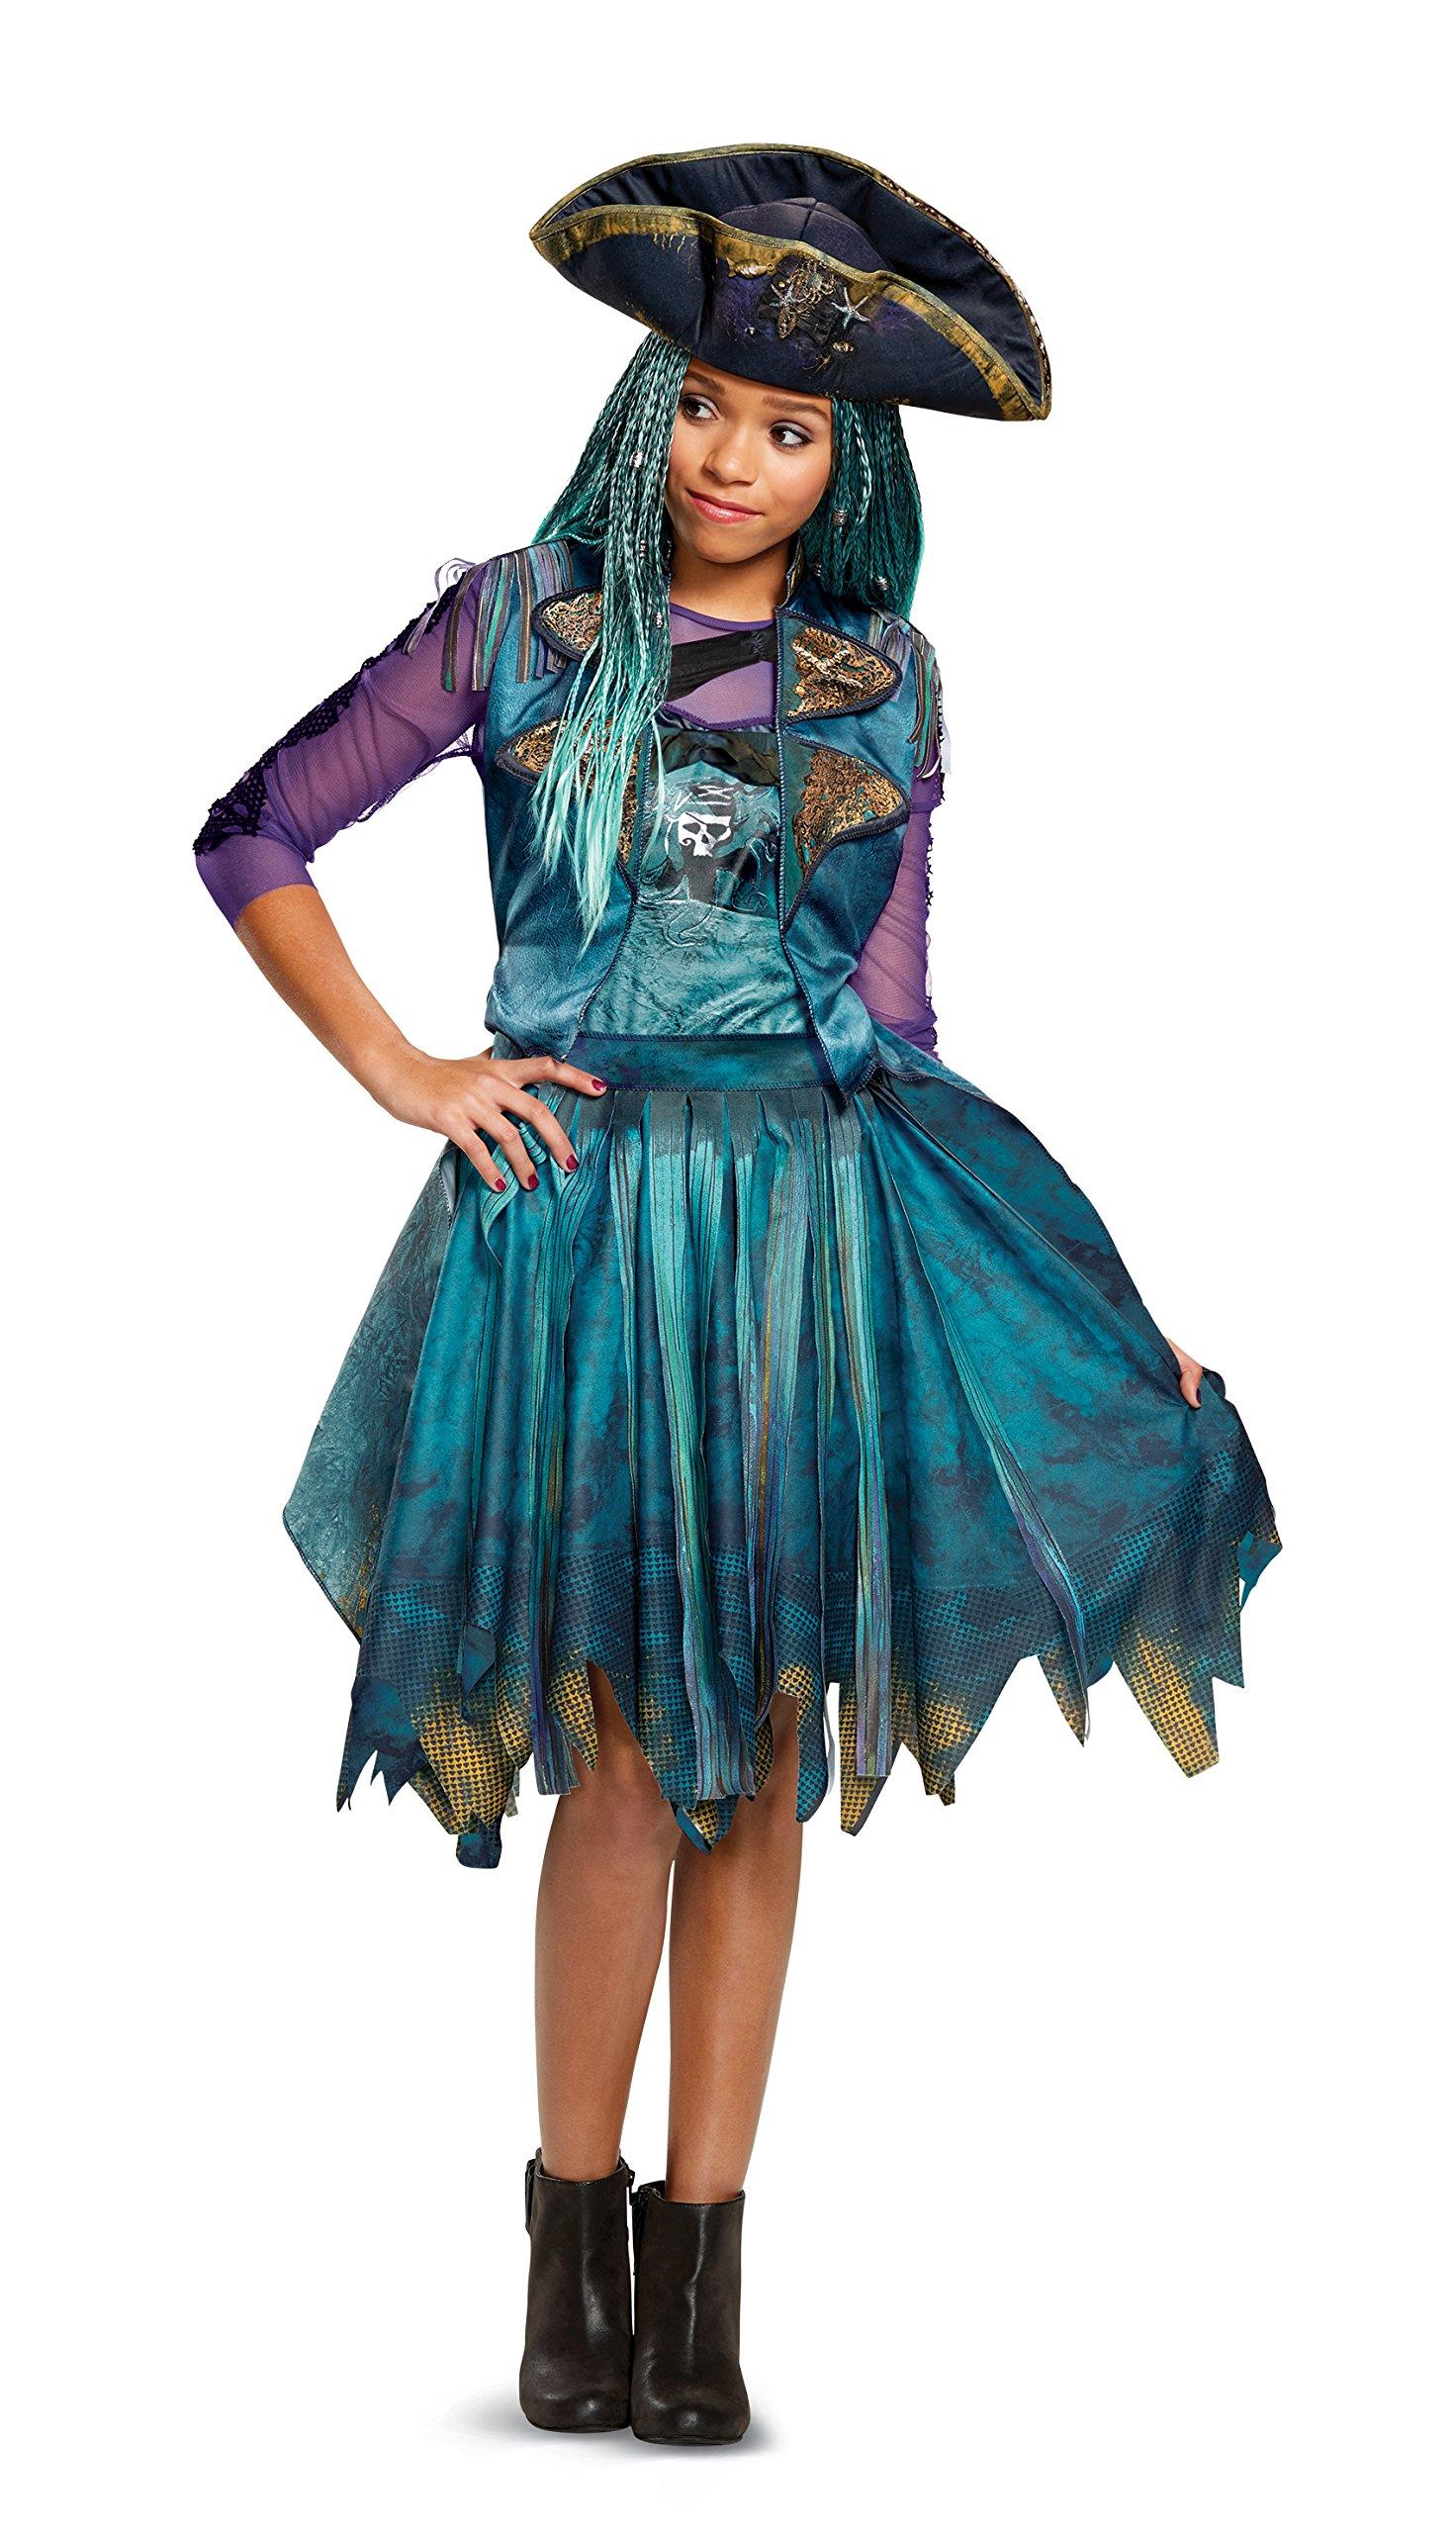 Disney Uma Classic Descendants 2 Costume, Teal, Small (4-6X)